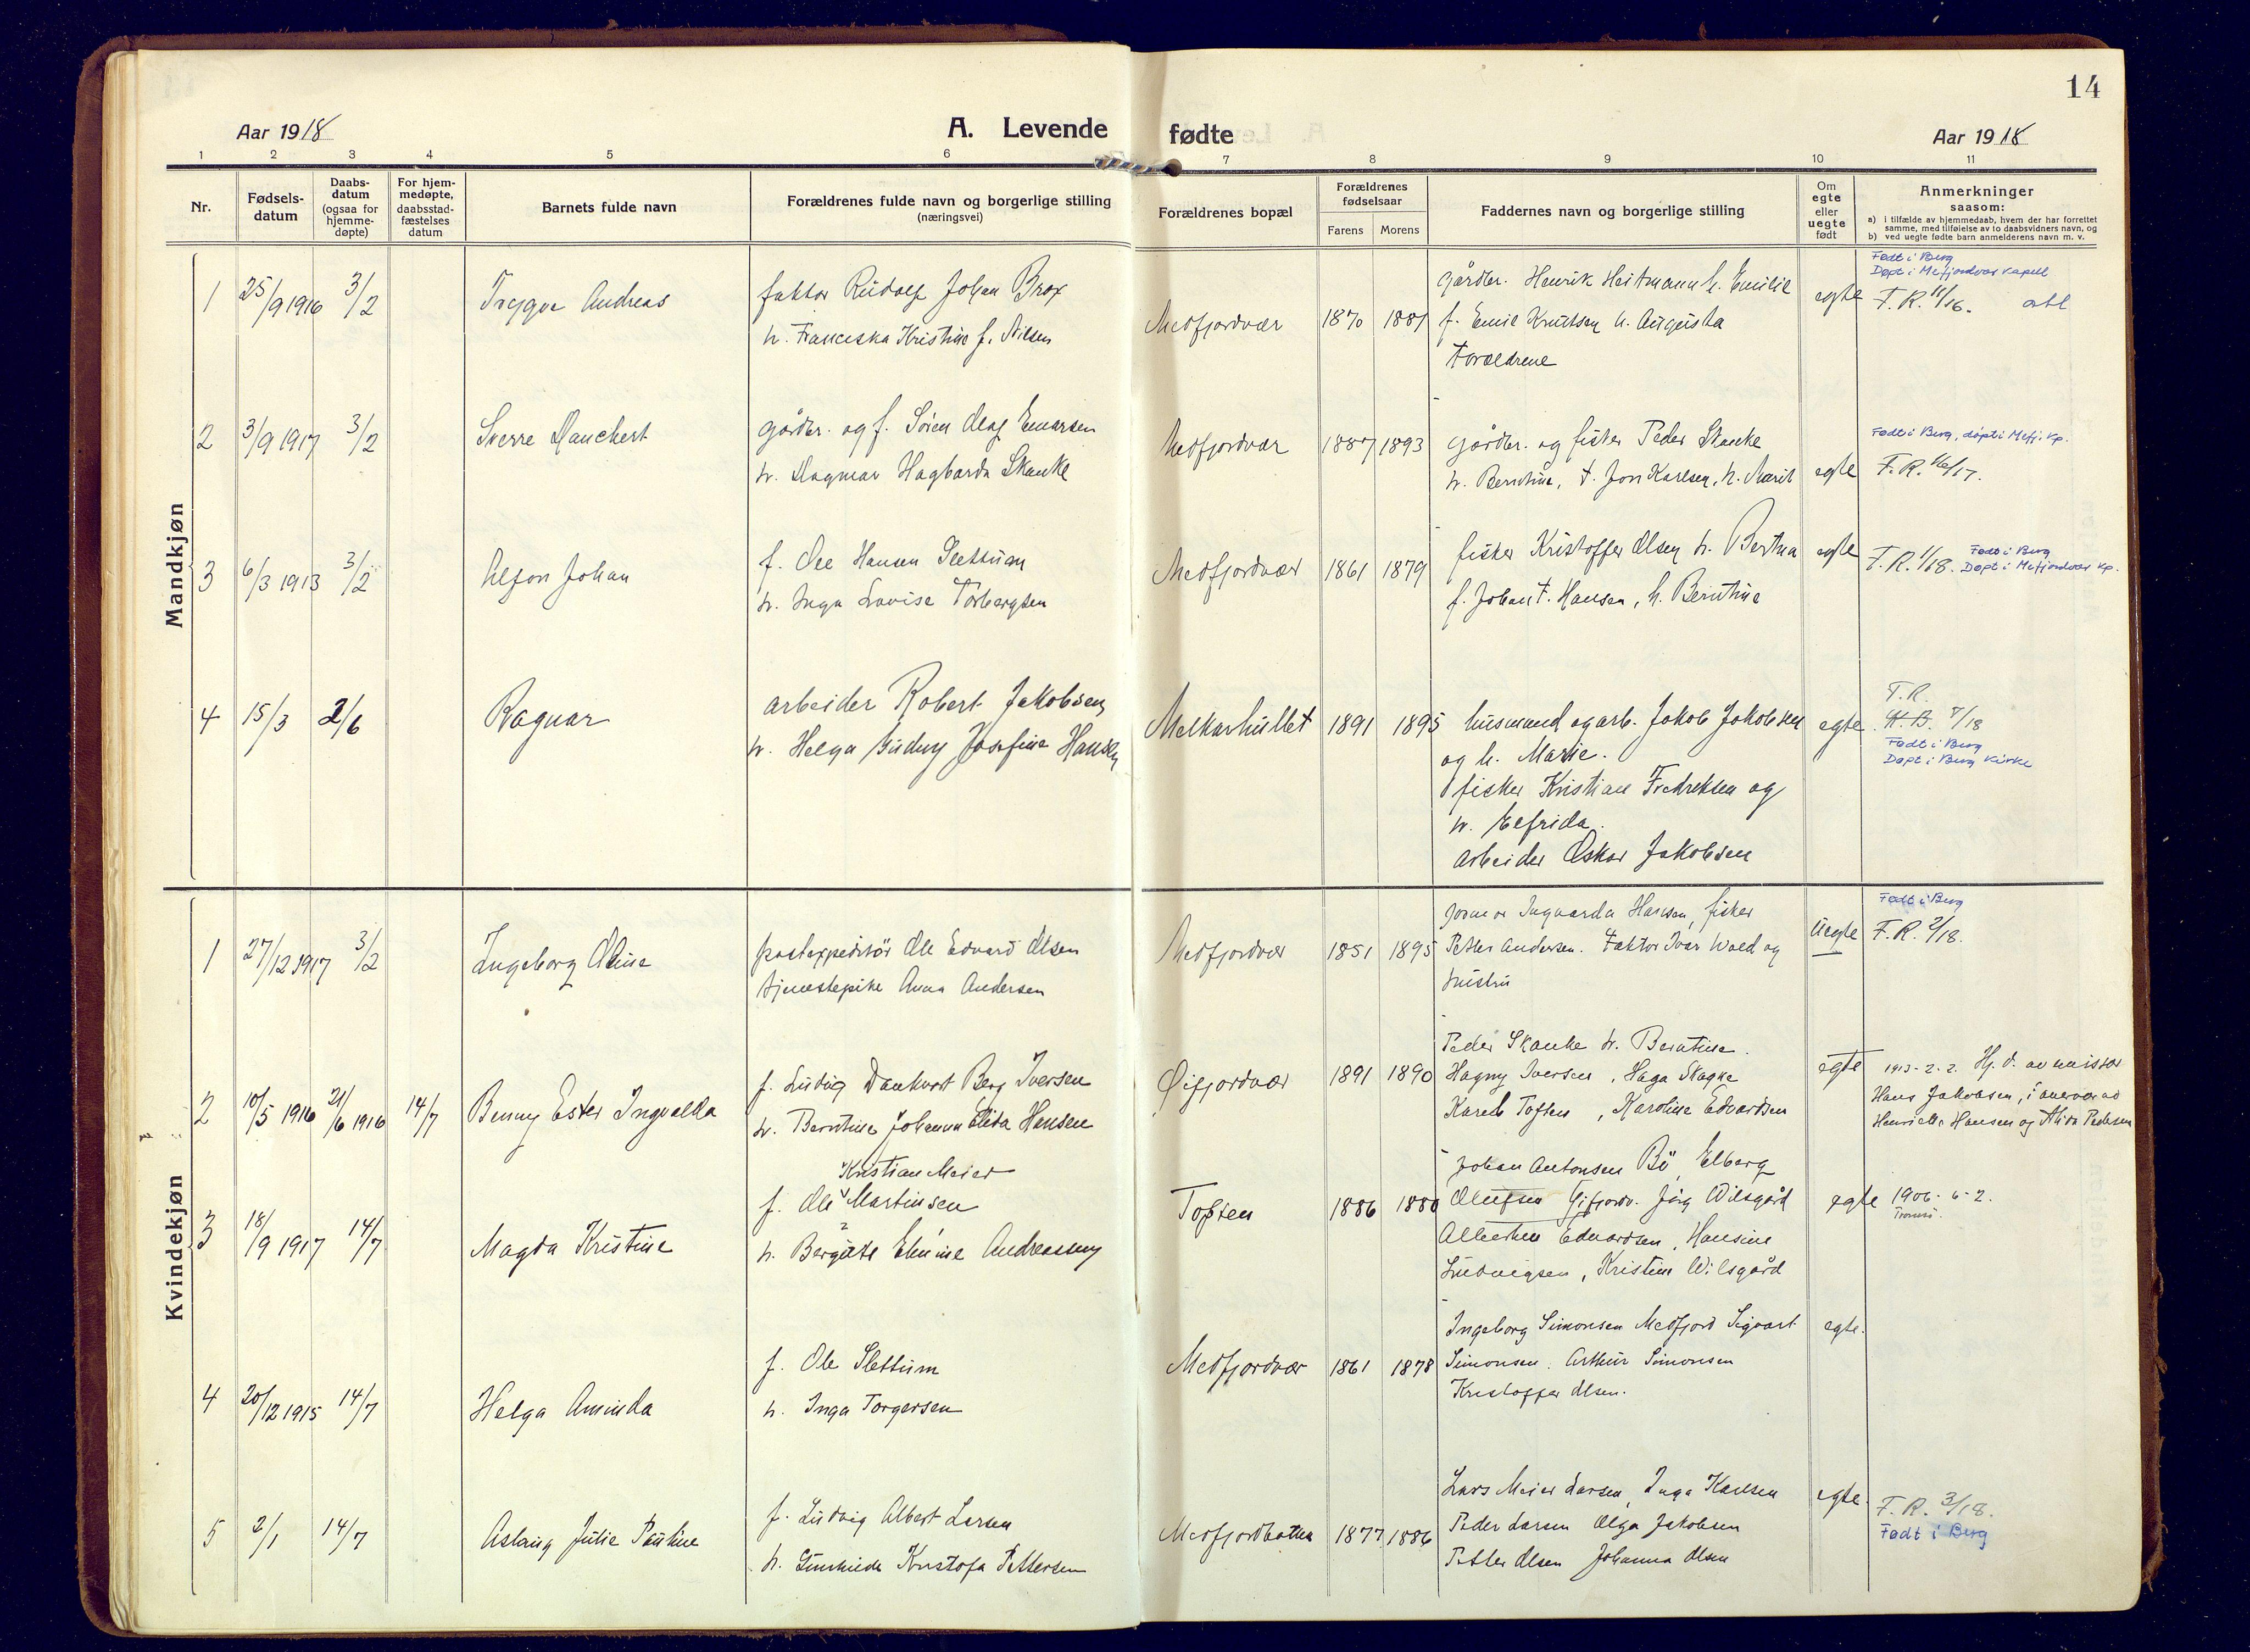 SATØ, Mefjord/Berg sokneprestkontor, G/Ga/Gaa: Ministerialbok nr. 9, 1916-1928, s. 14